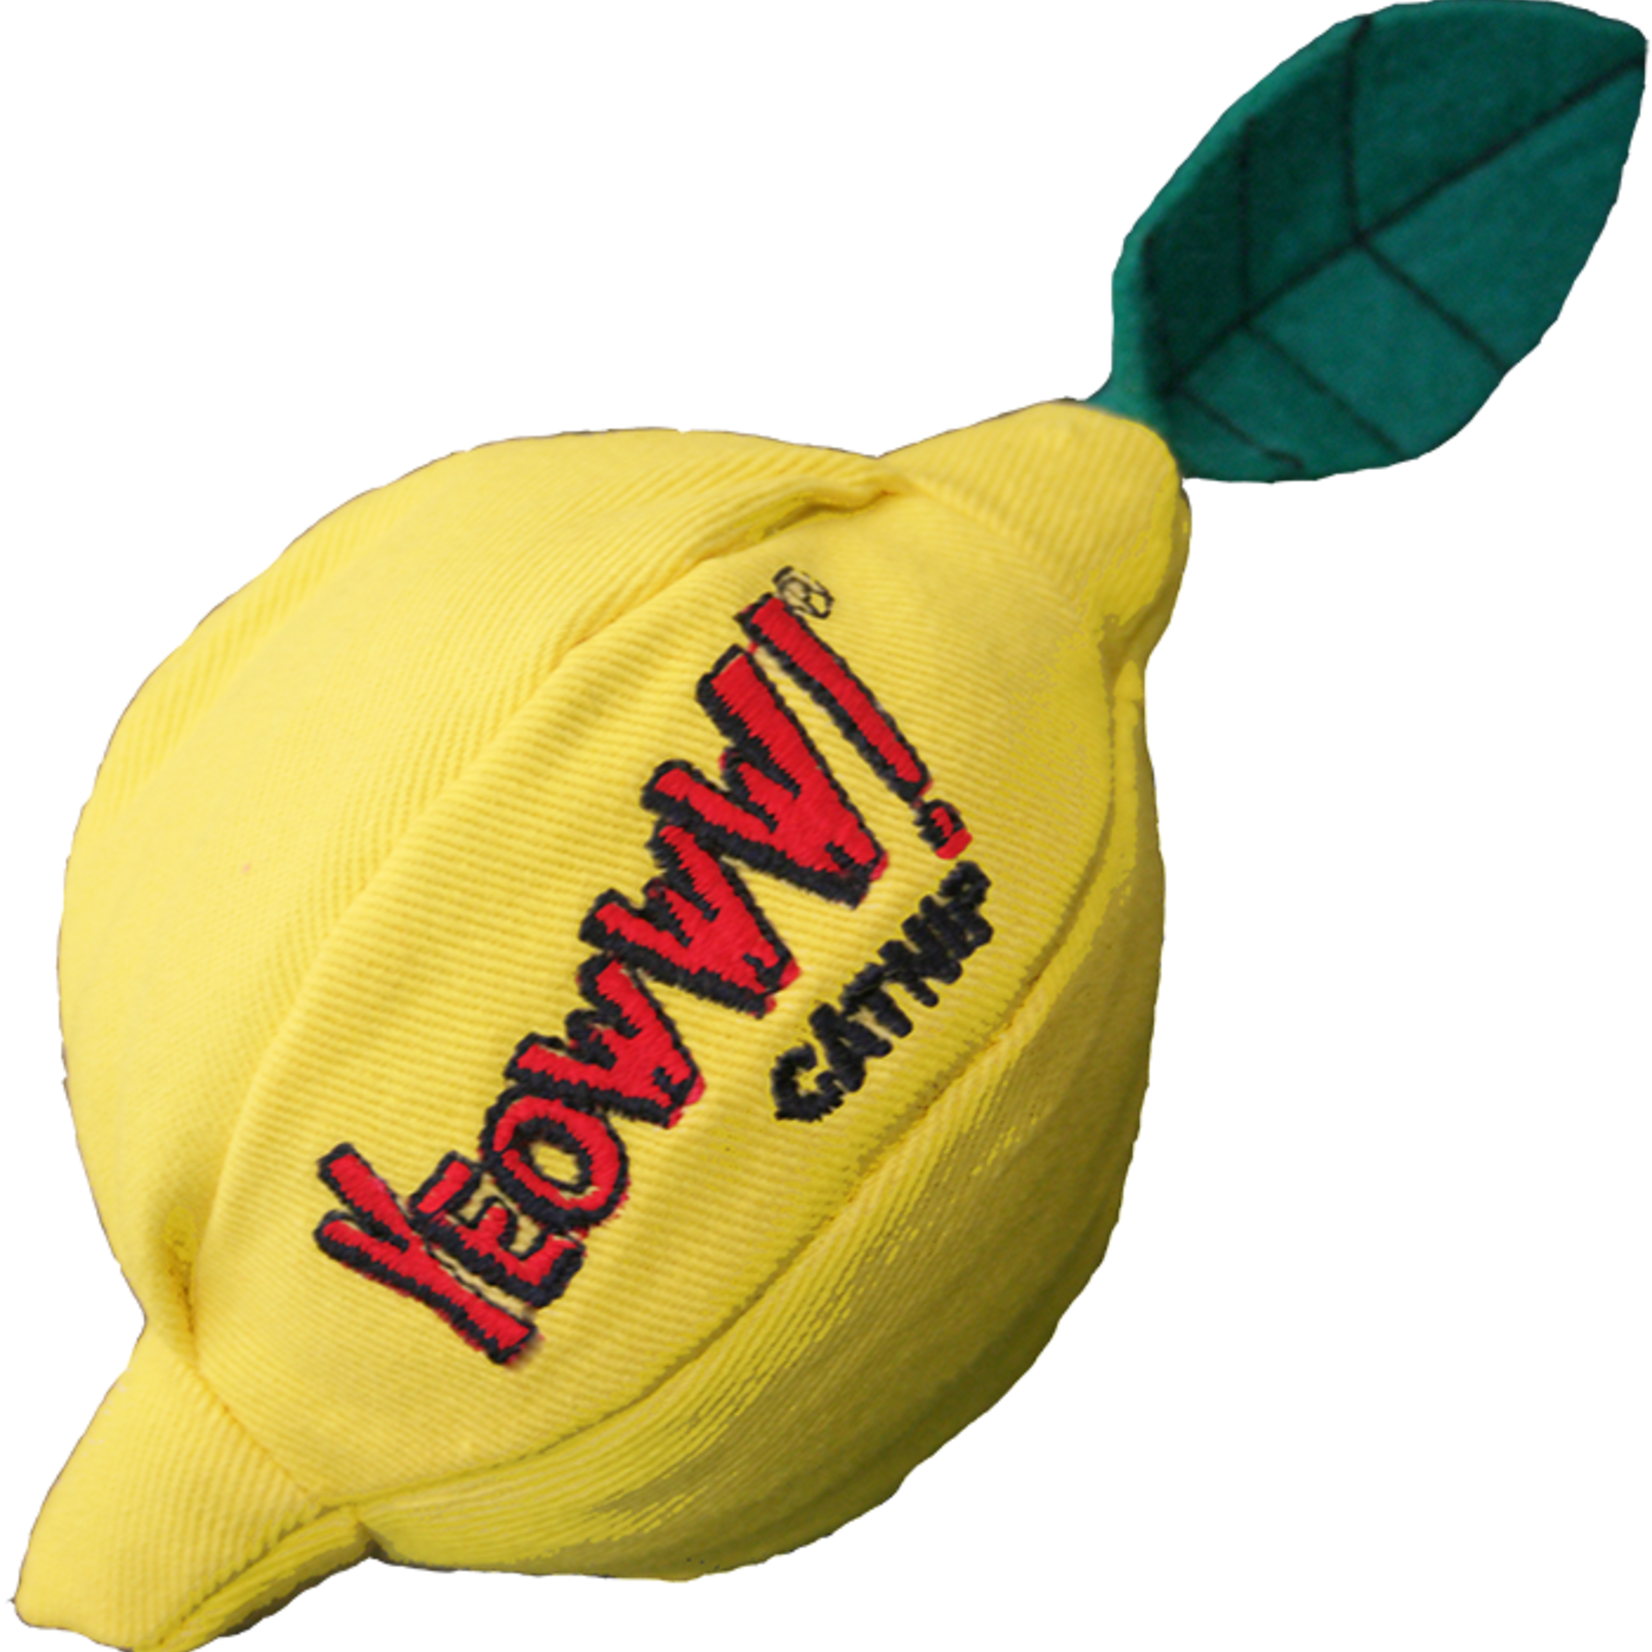 Ducky World Inc. Ducky World Yeow! Catnip Lemon